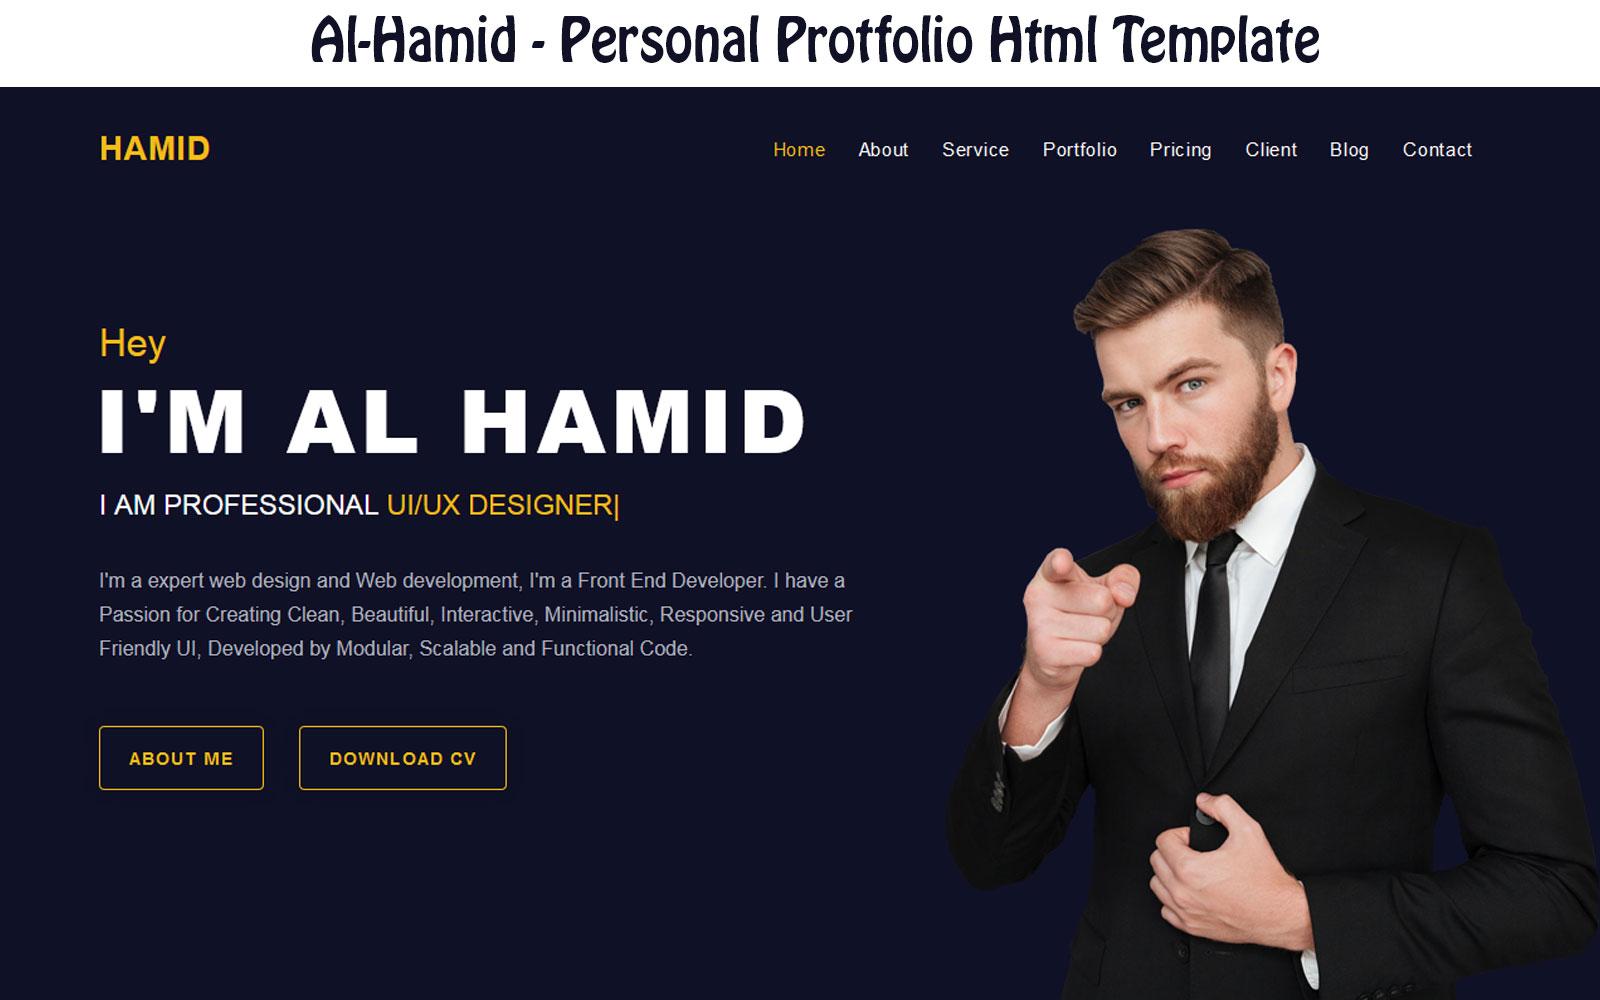 Al-Hamid - Personal Protfolio Html Landing Page Template